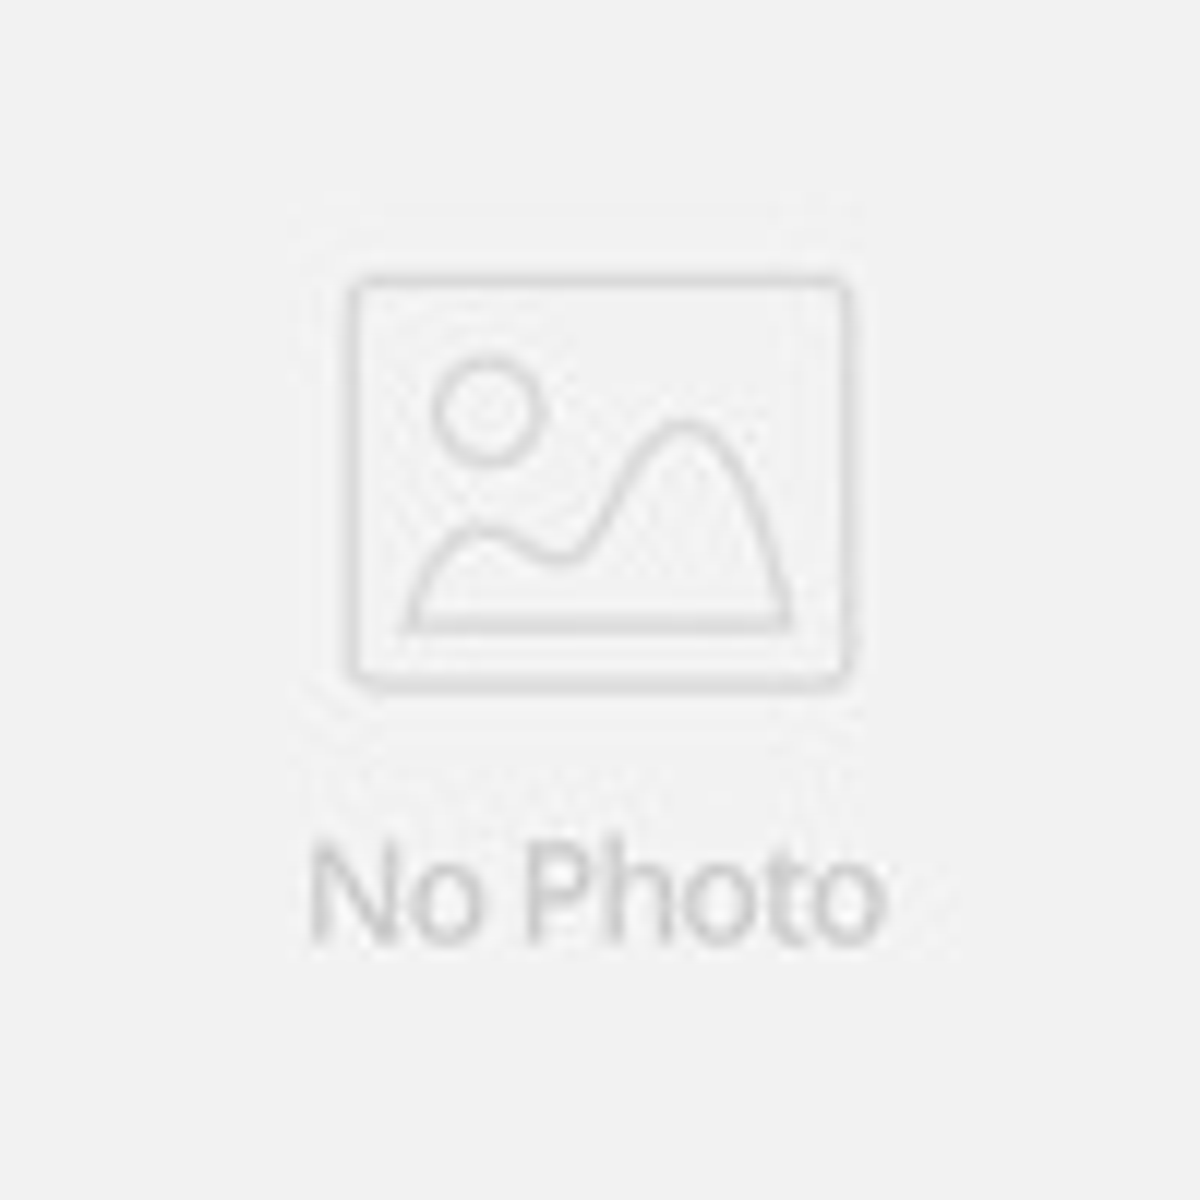 Image result for handbag photo